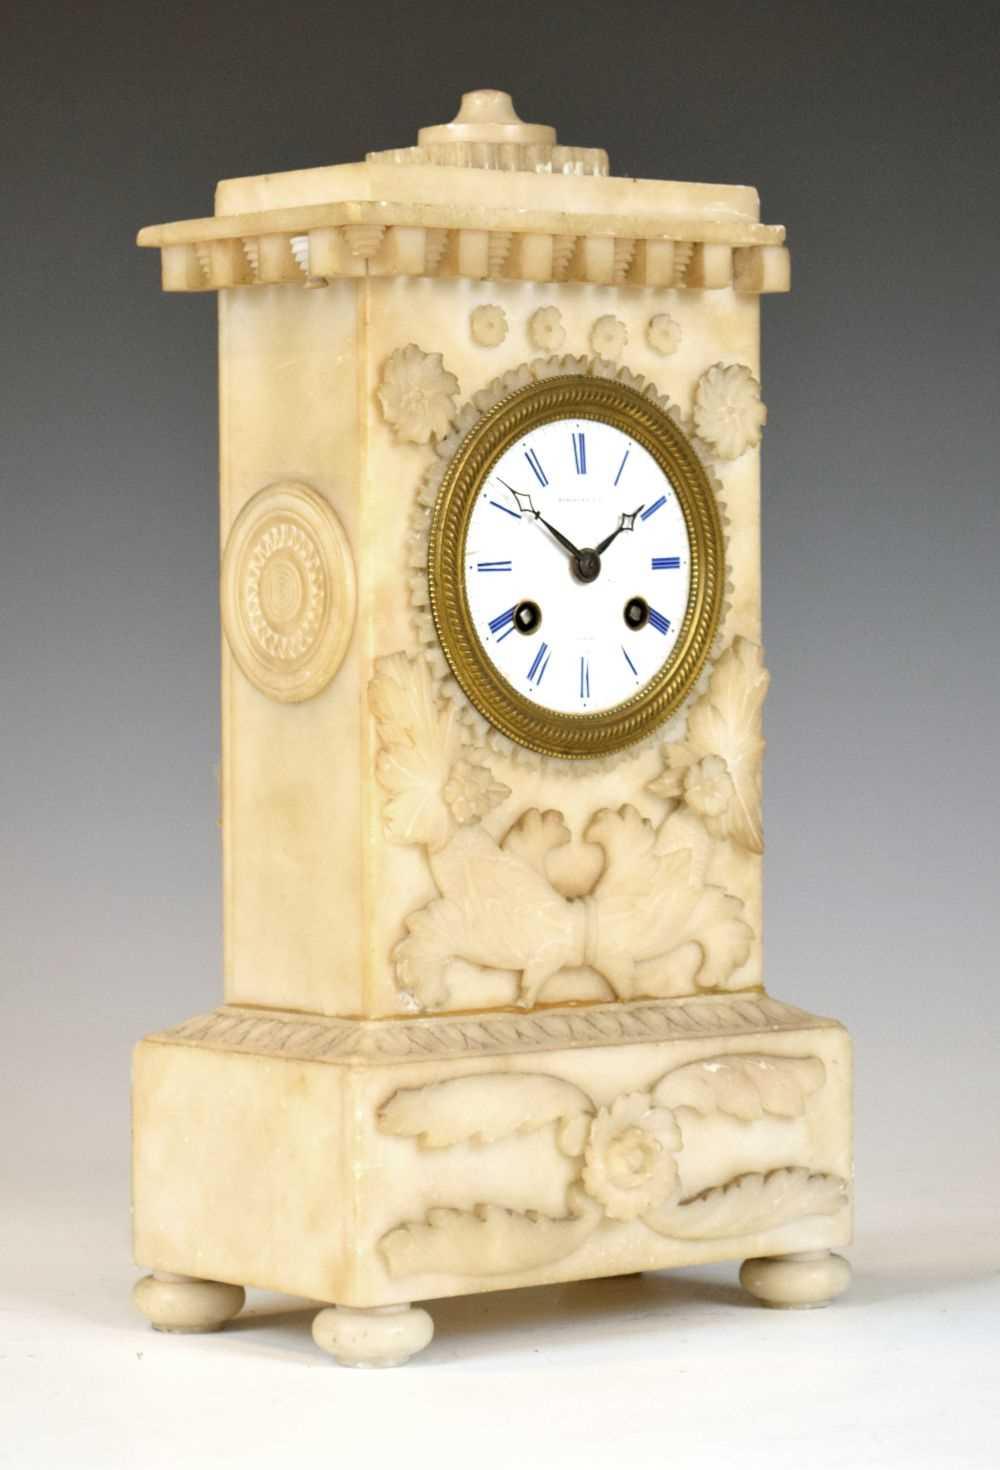 19th Century French alabaster mantel clock, Hodgkins & Co, Paris, No. 7138